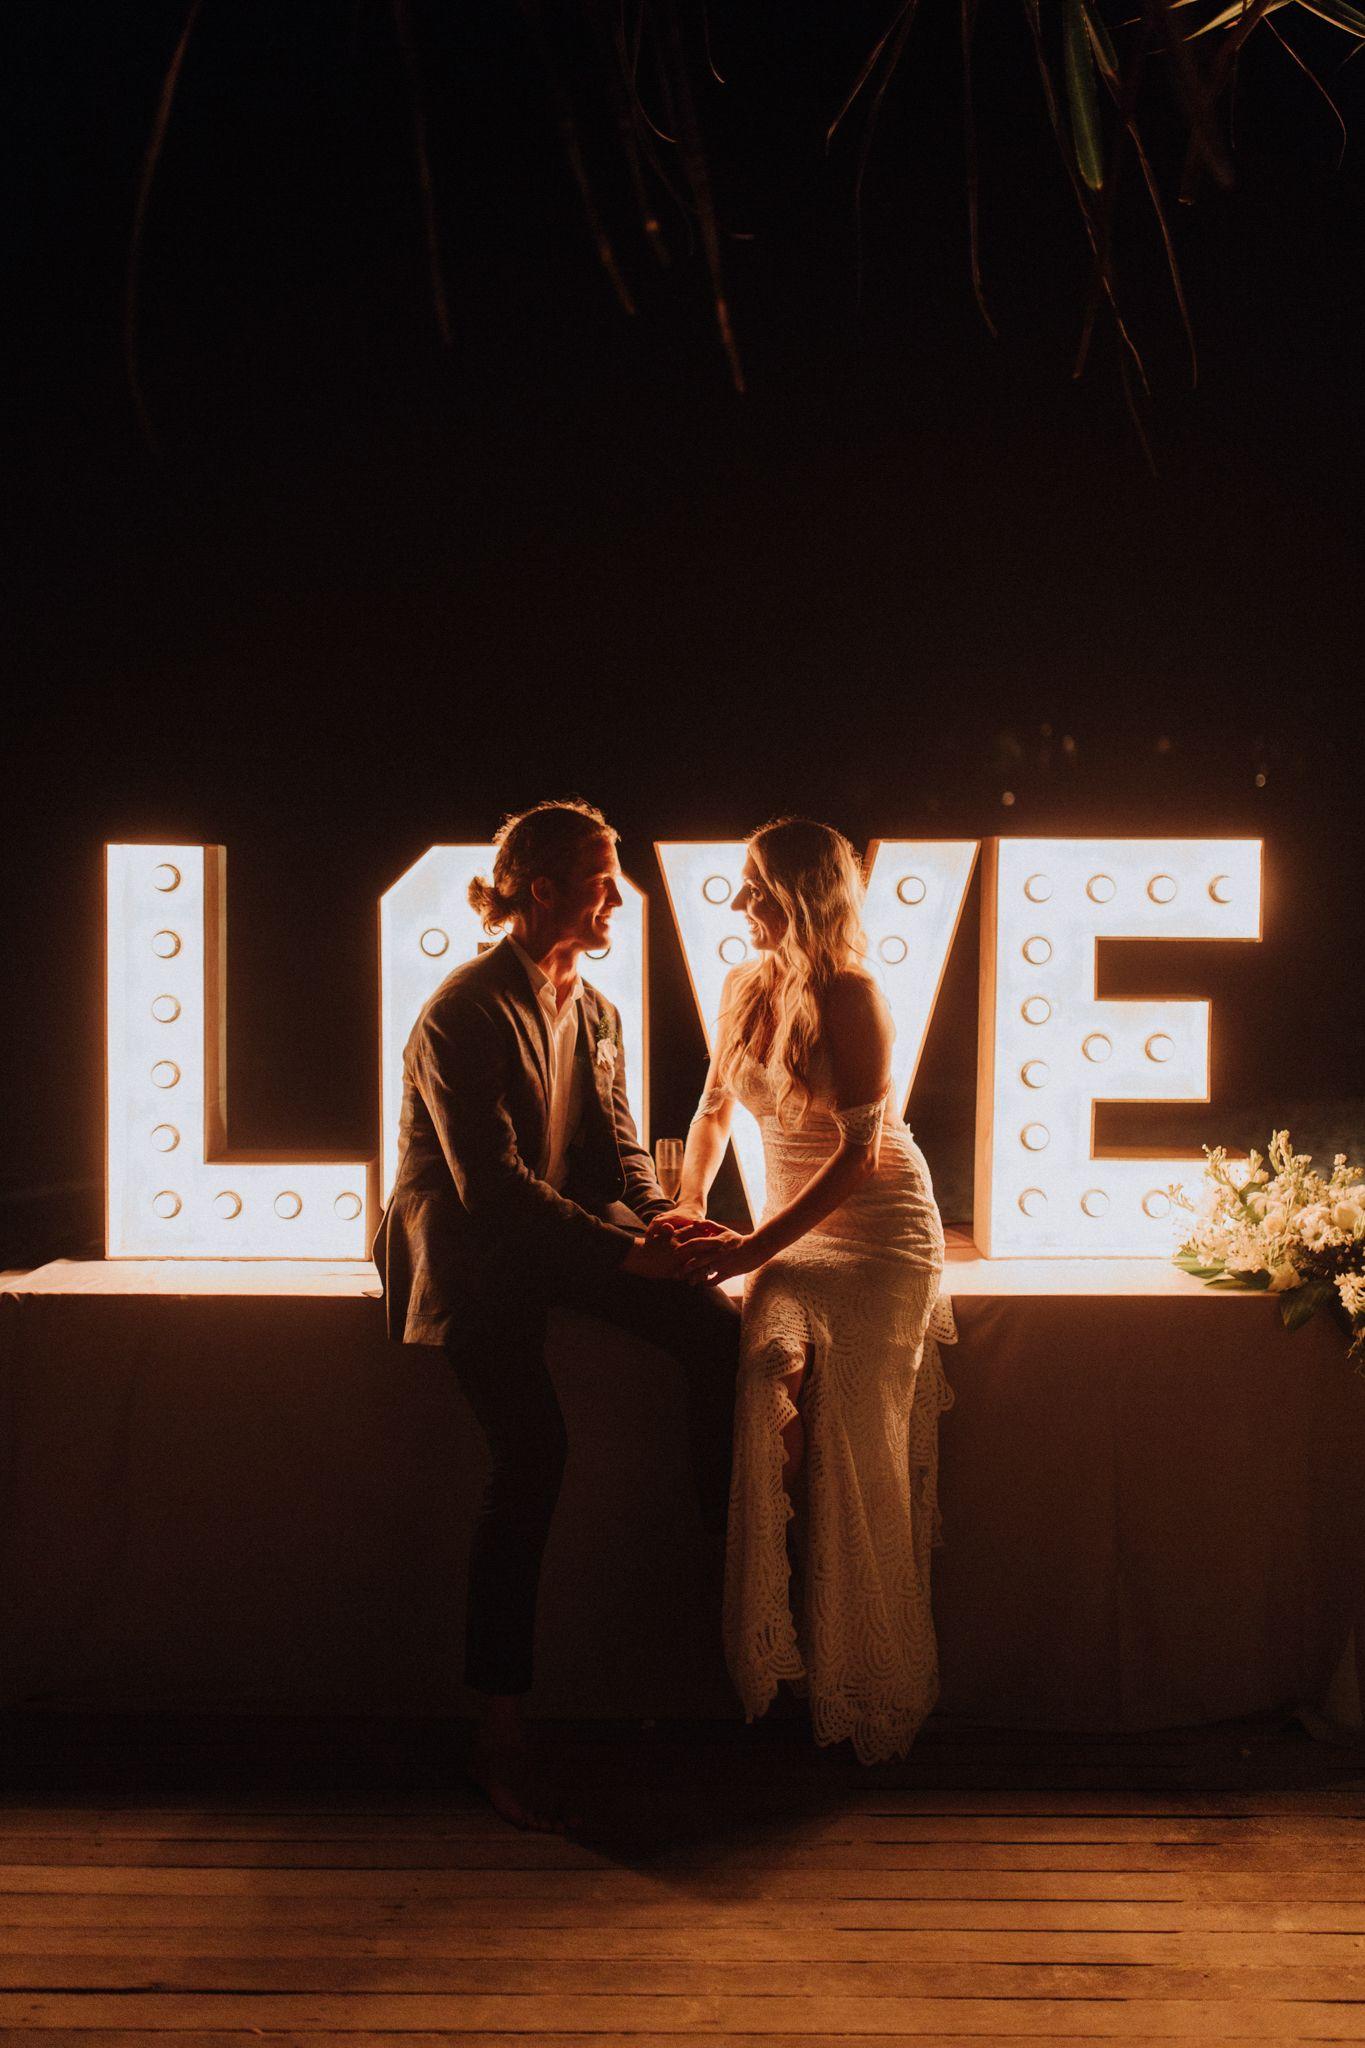 Sandy Bay Nusa Lembongan Bali Beach Wedding of Corbin and Nicola giant light letters decor